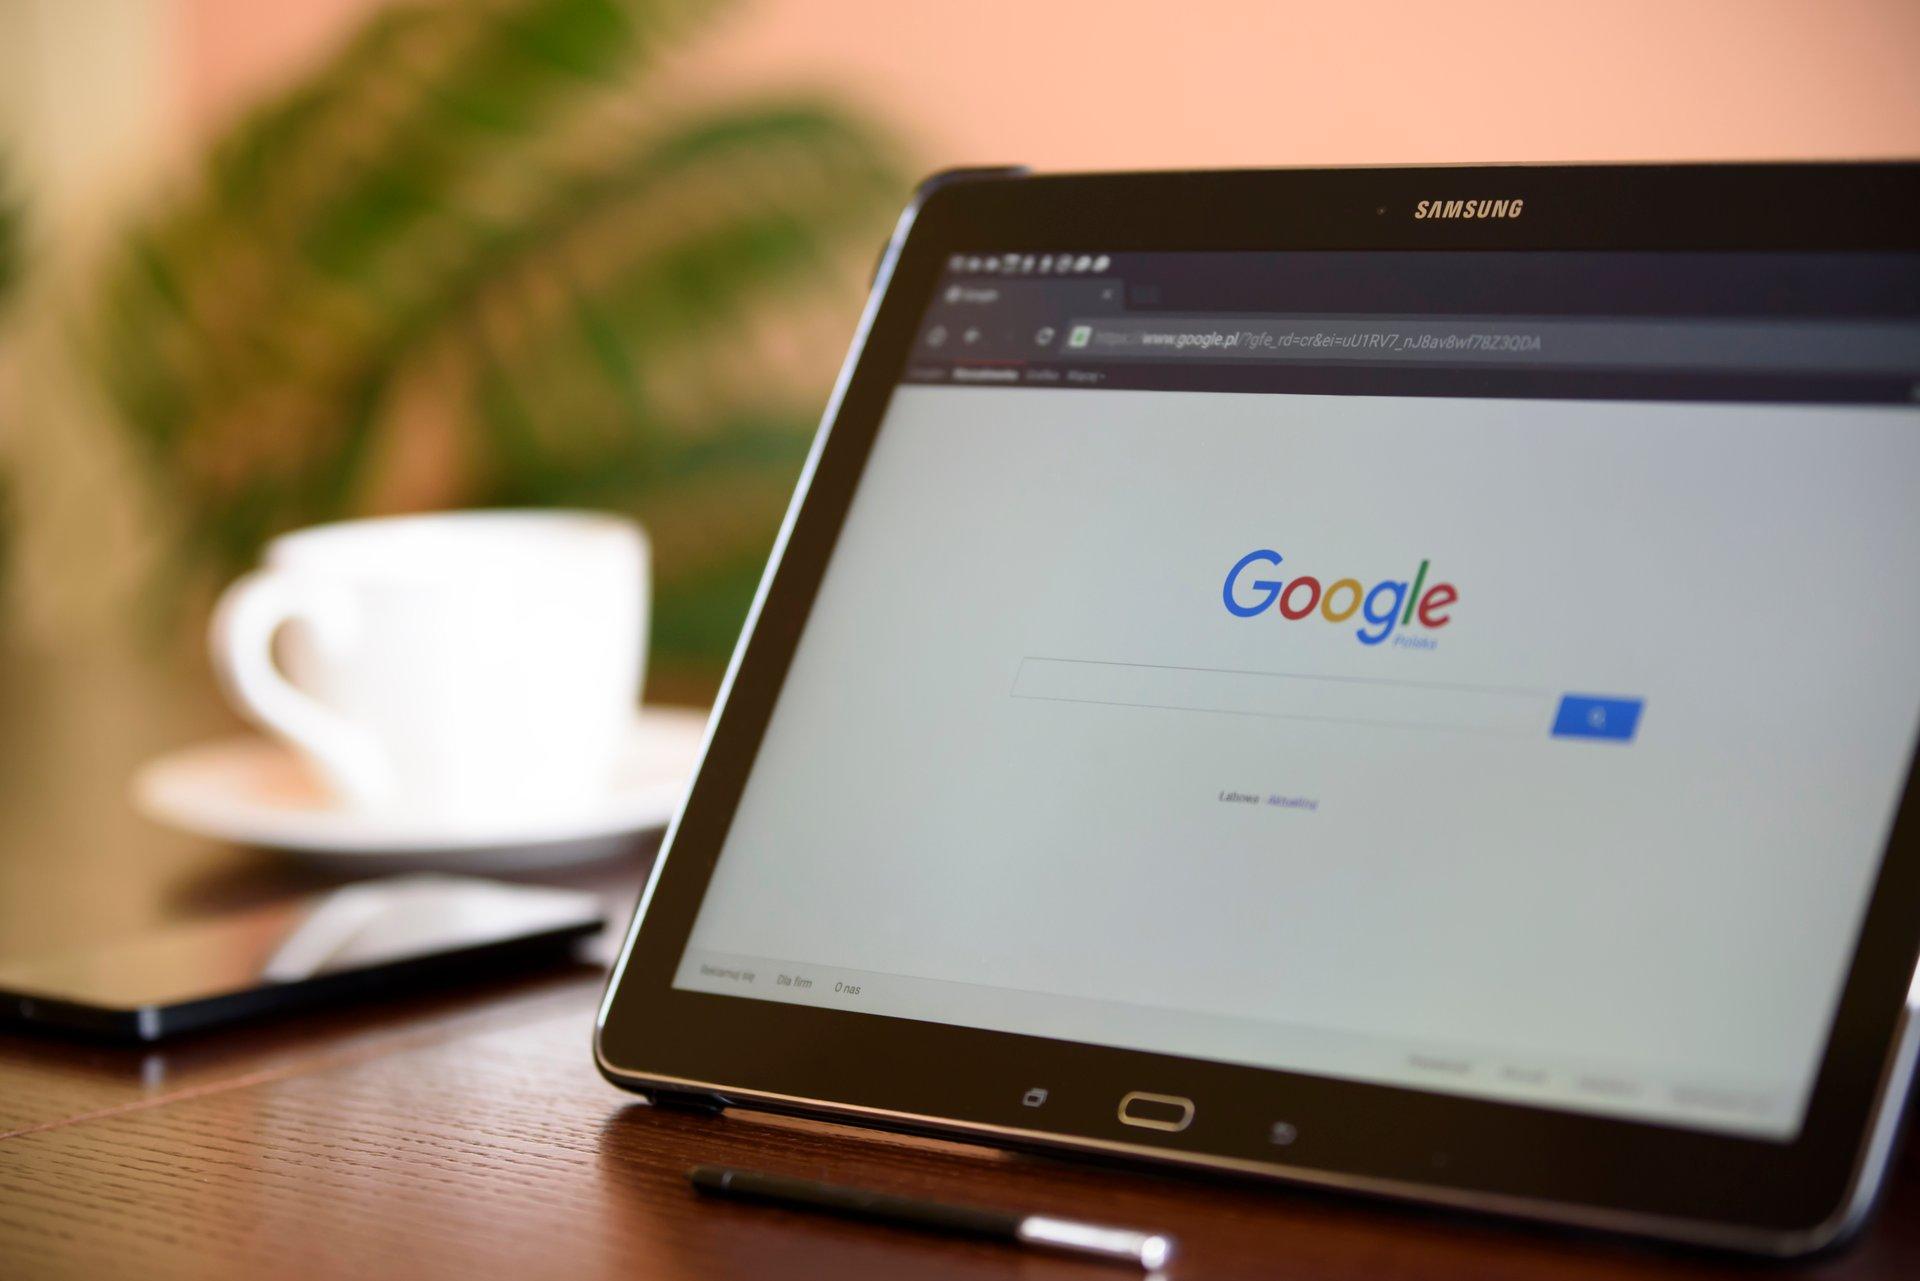 laptop showing Google website